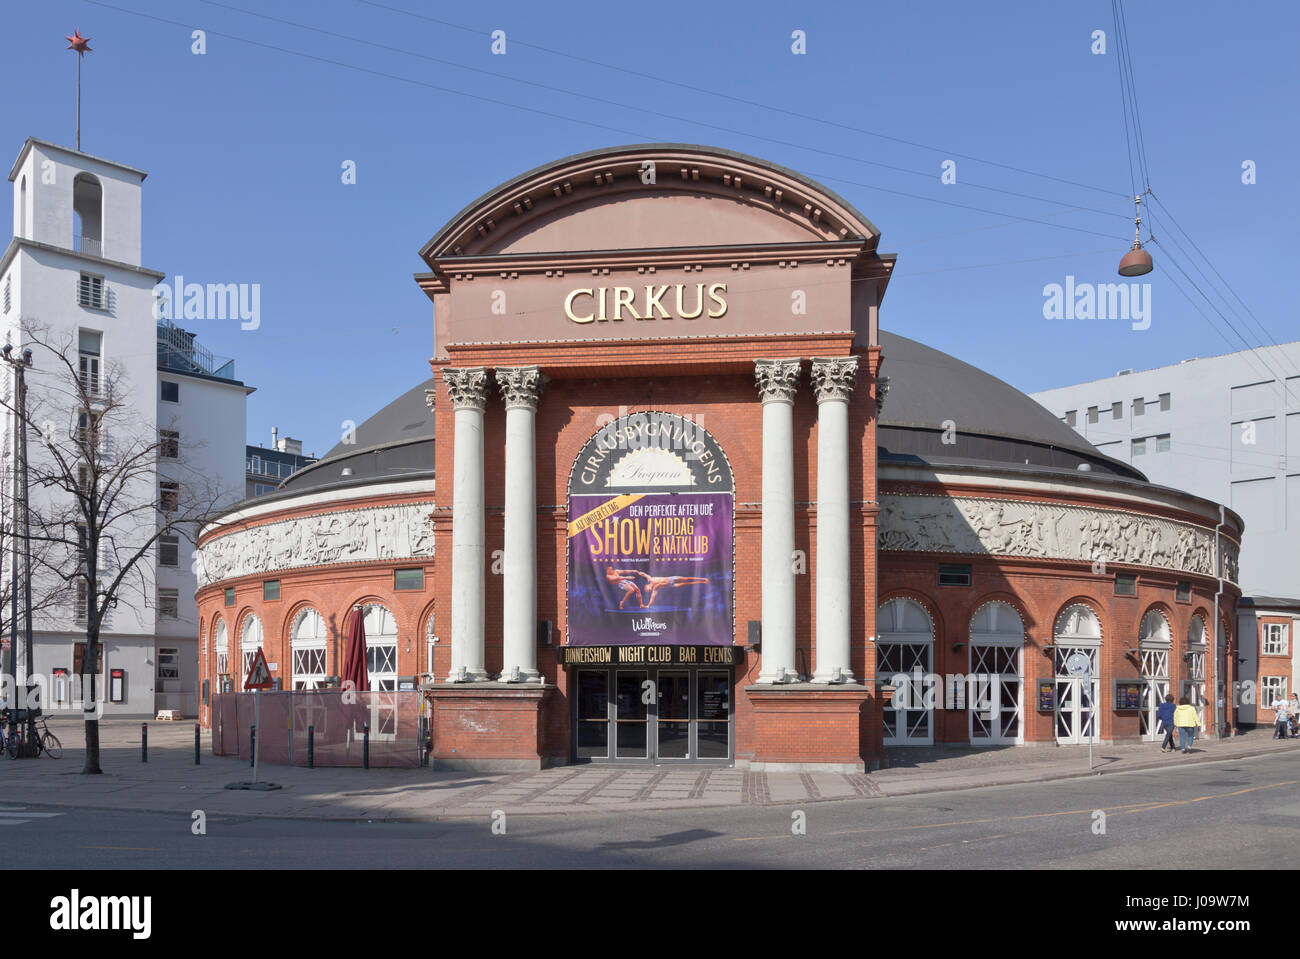 The old Cirkusbygning, the Circus Building, at Axeltorv in central Copenhagen. - Stock Image